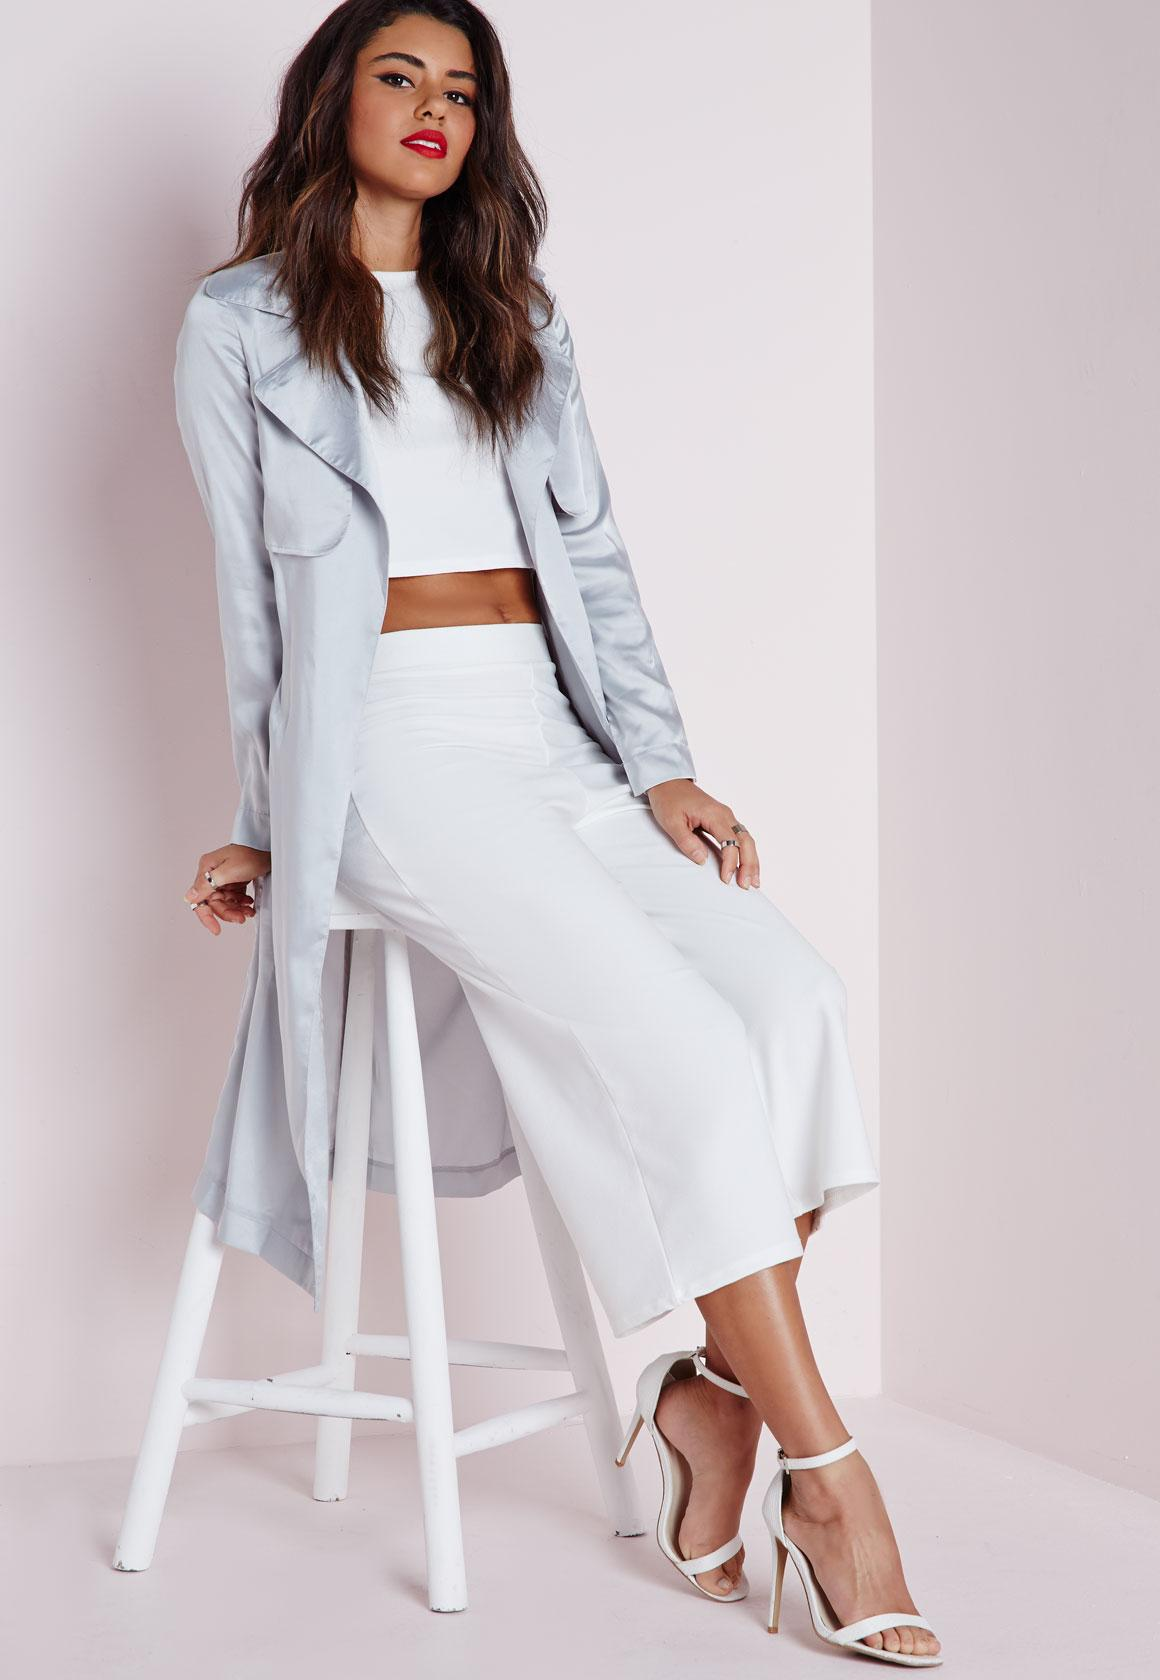 white-culottes-pants-white-crop-top-grayl-jacket-coat-trench-white-shoe-sandalh-spring-summer-brun-dinner.jpg